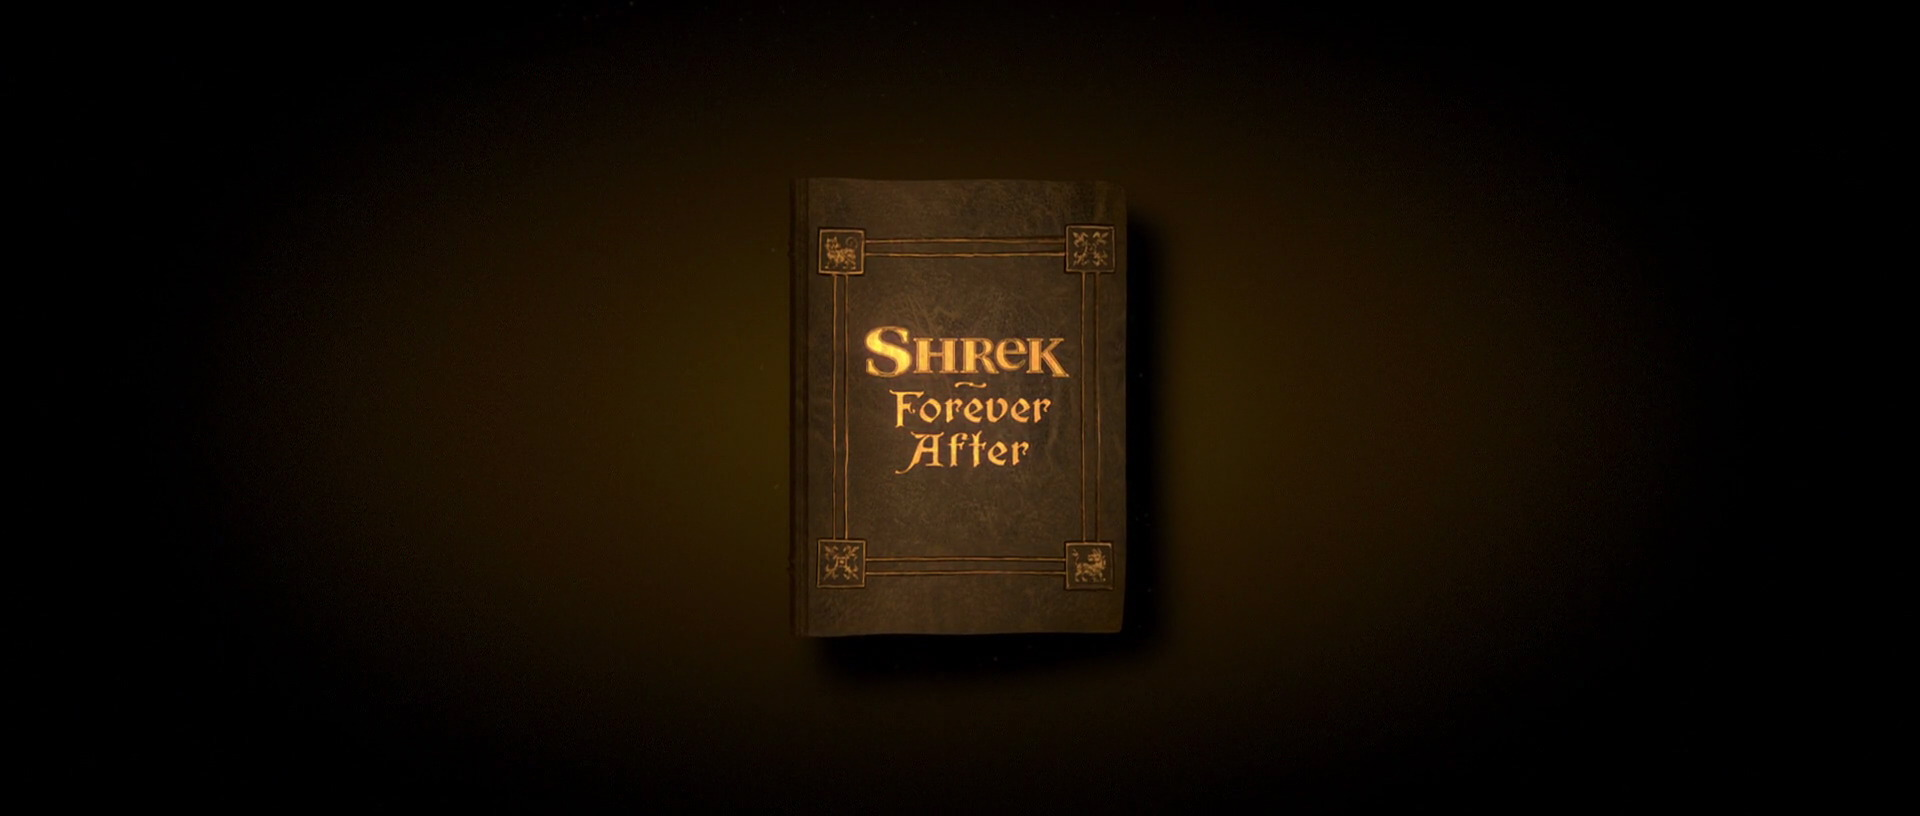 Shrek Forever After 2010 Animation Screencaps